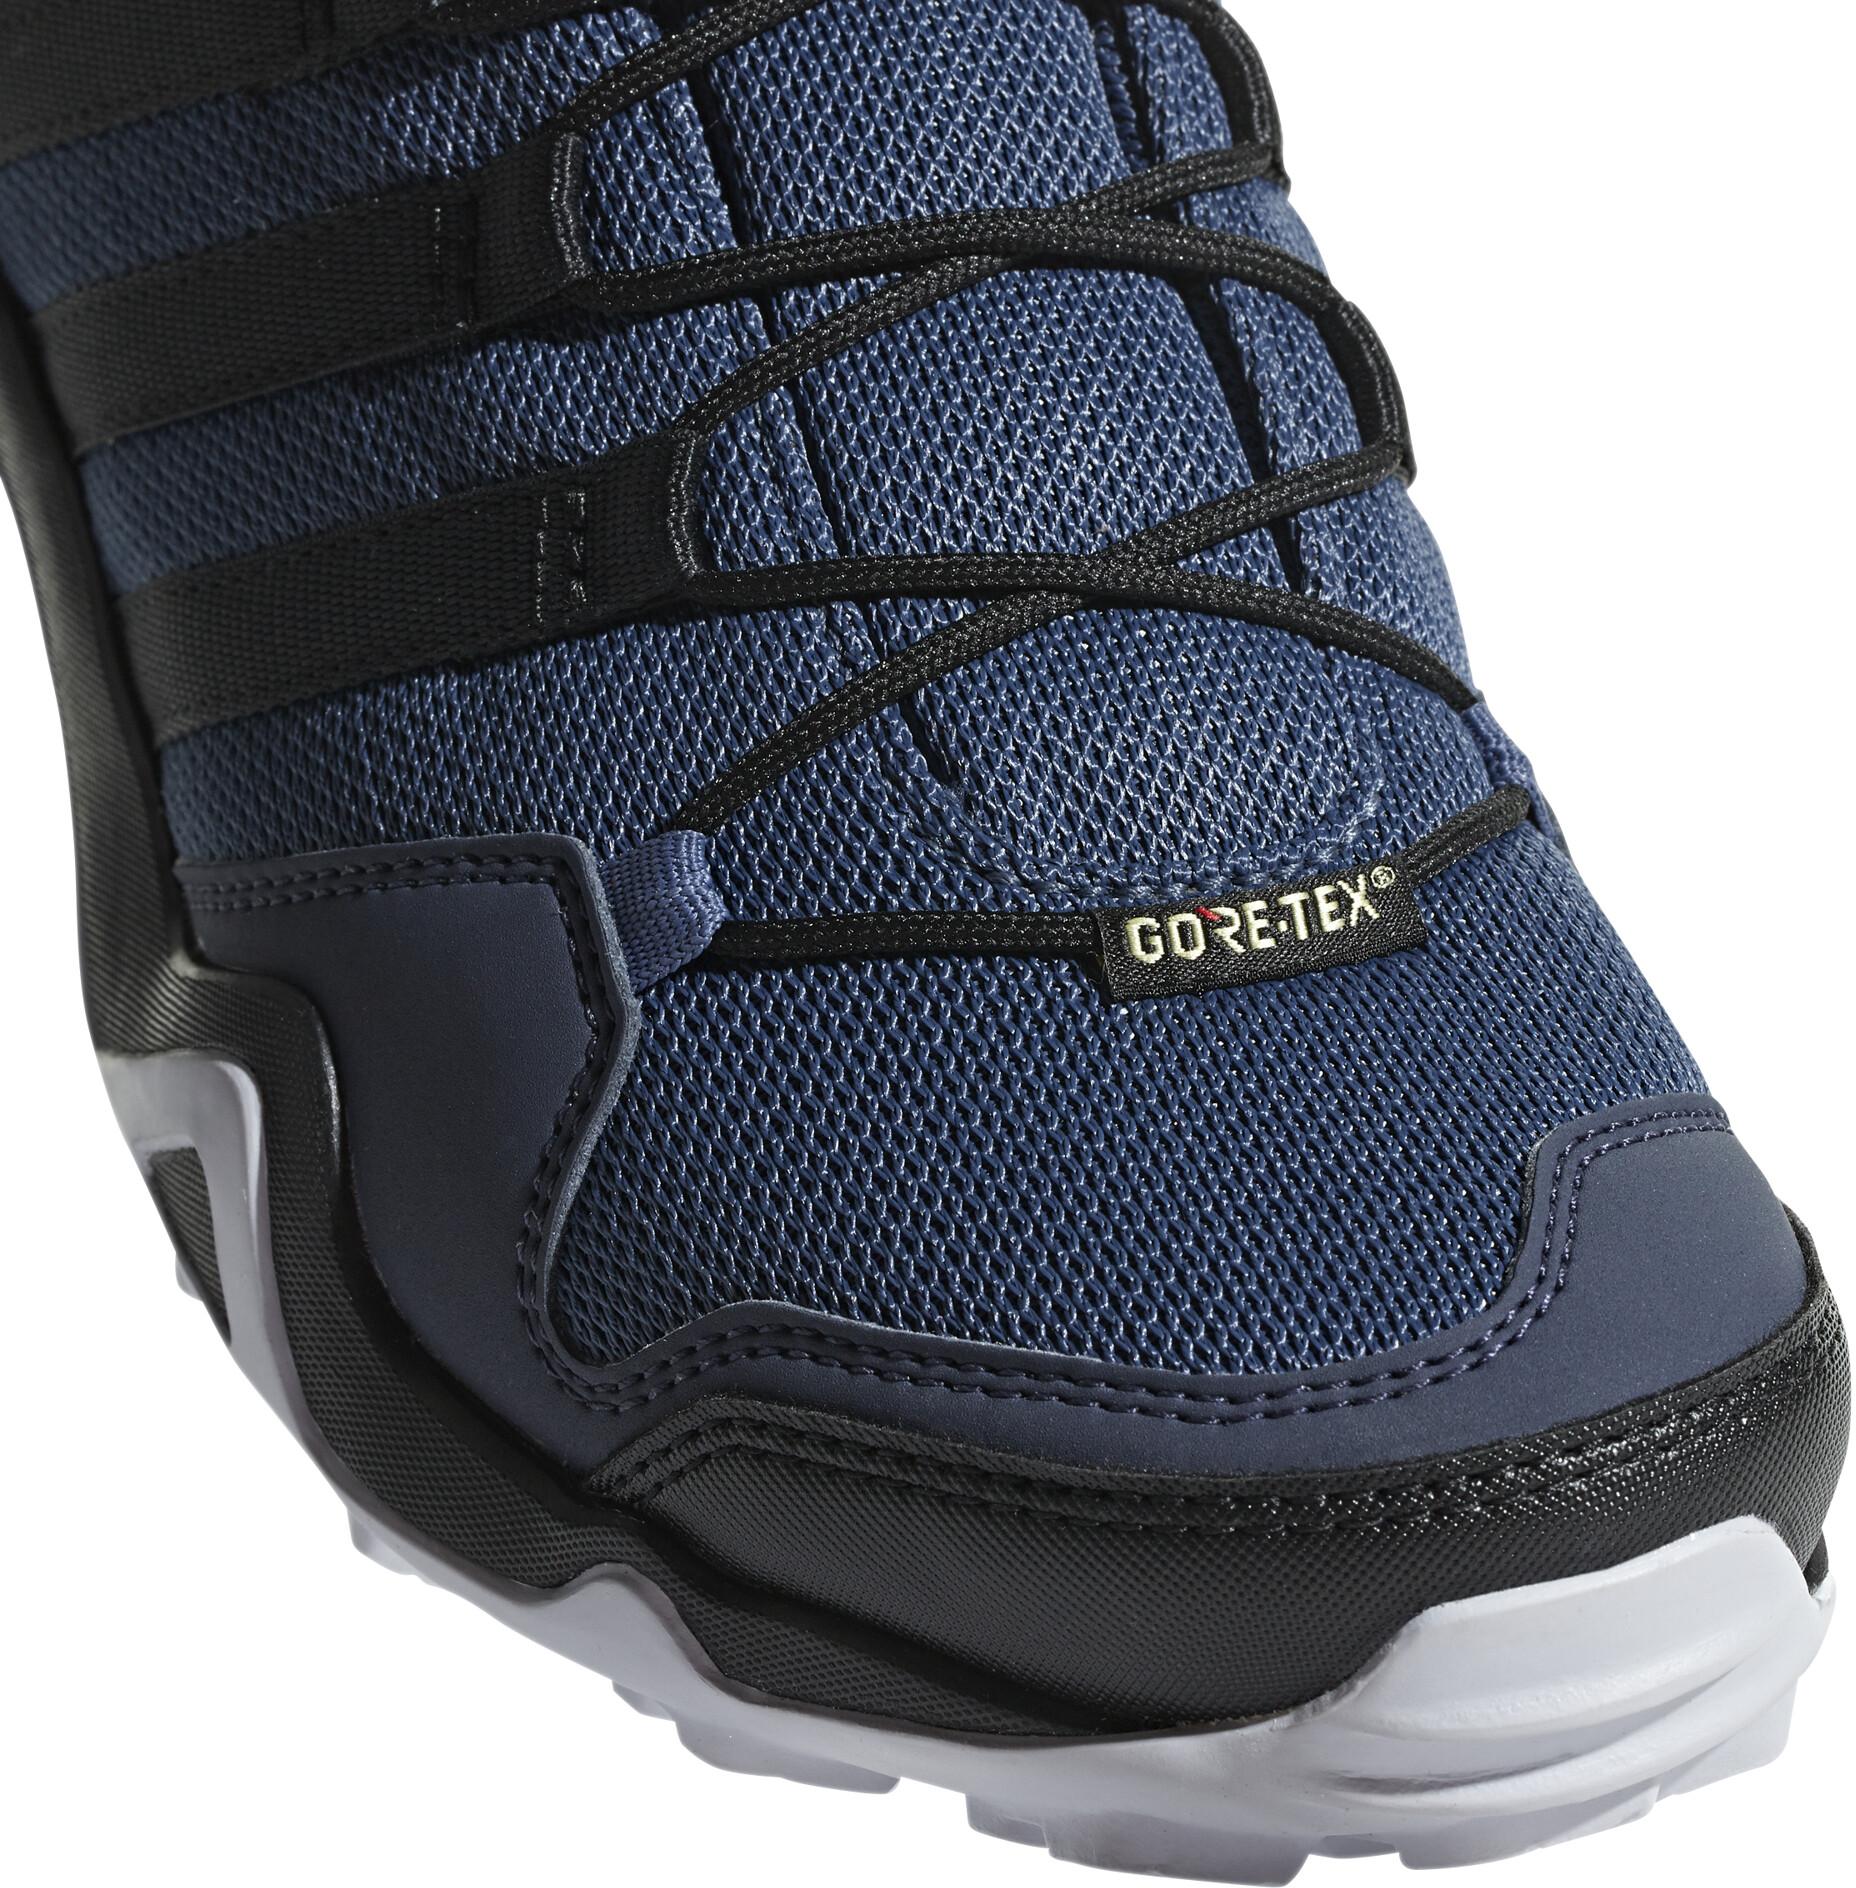 low priced 70c1f 5d3c4 adidas TERREX AX2R GTX Outdoor Shoes Women Raw SteelCore BlackAero Blue